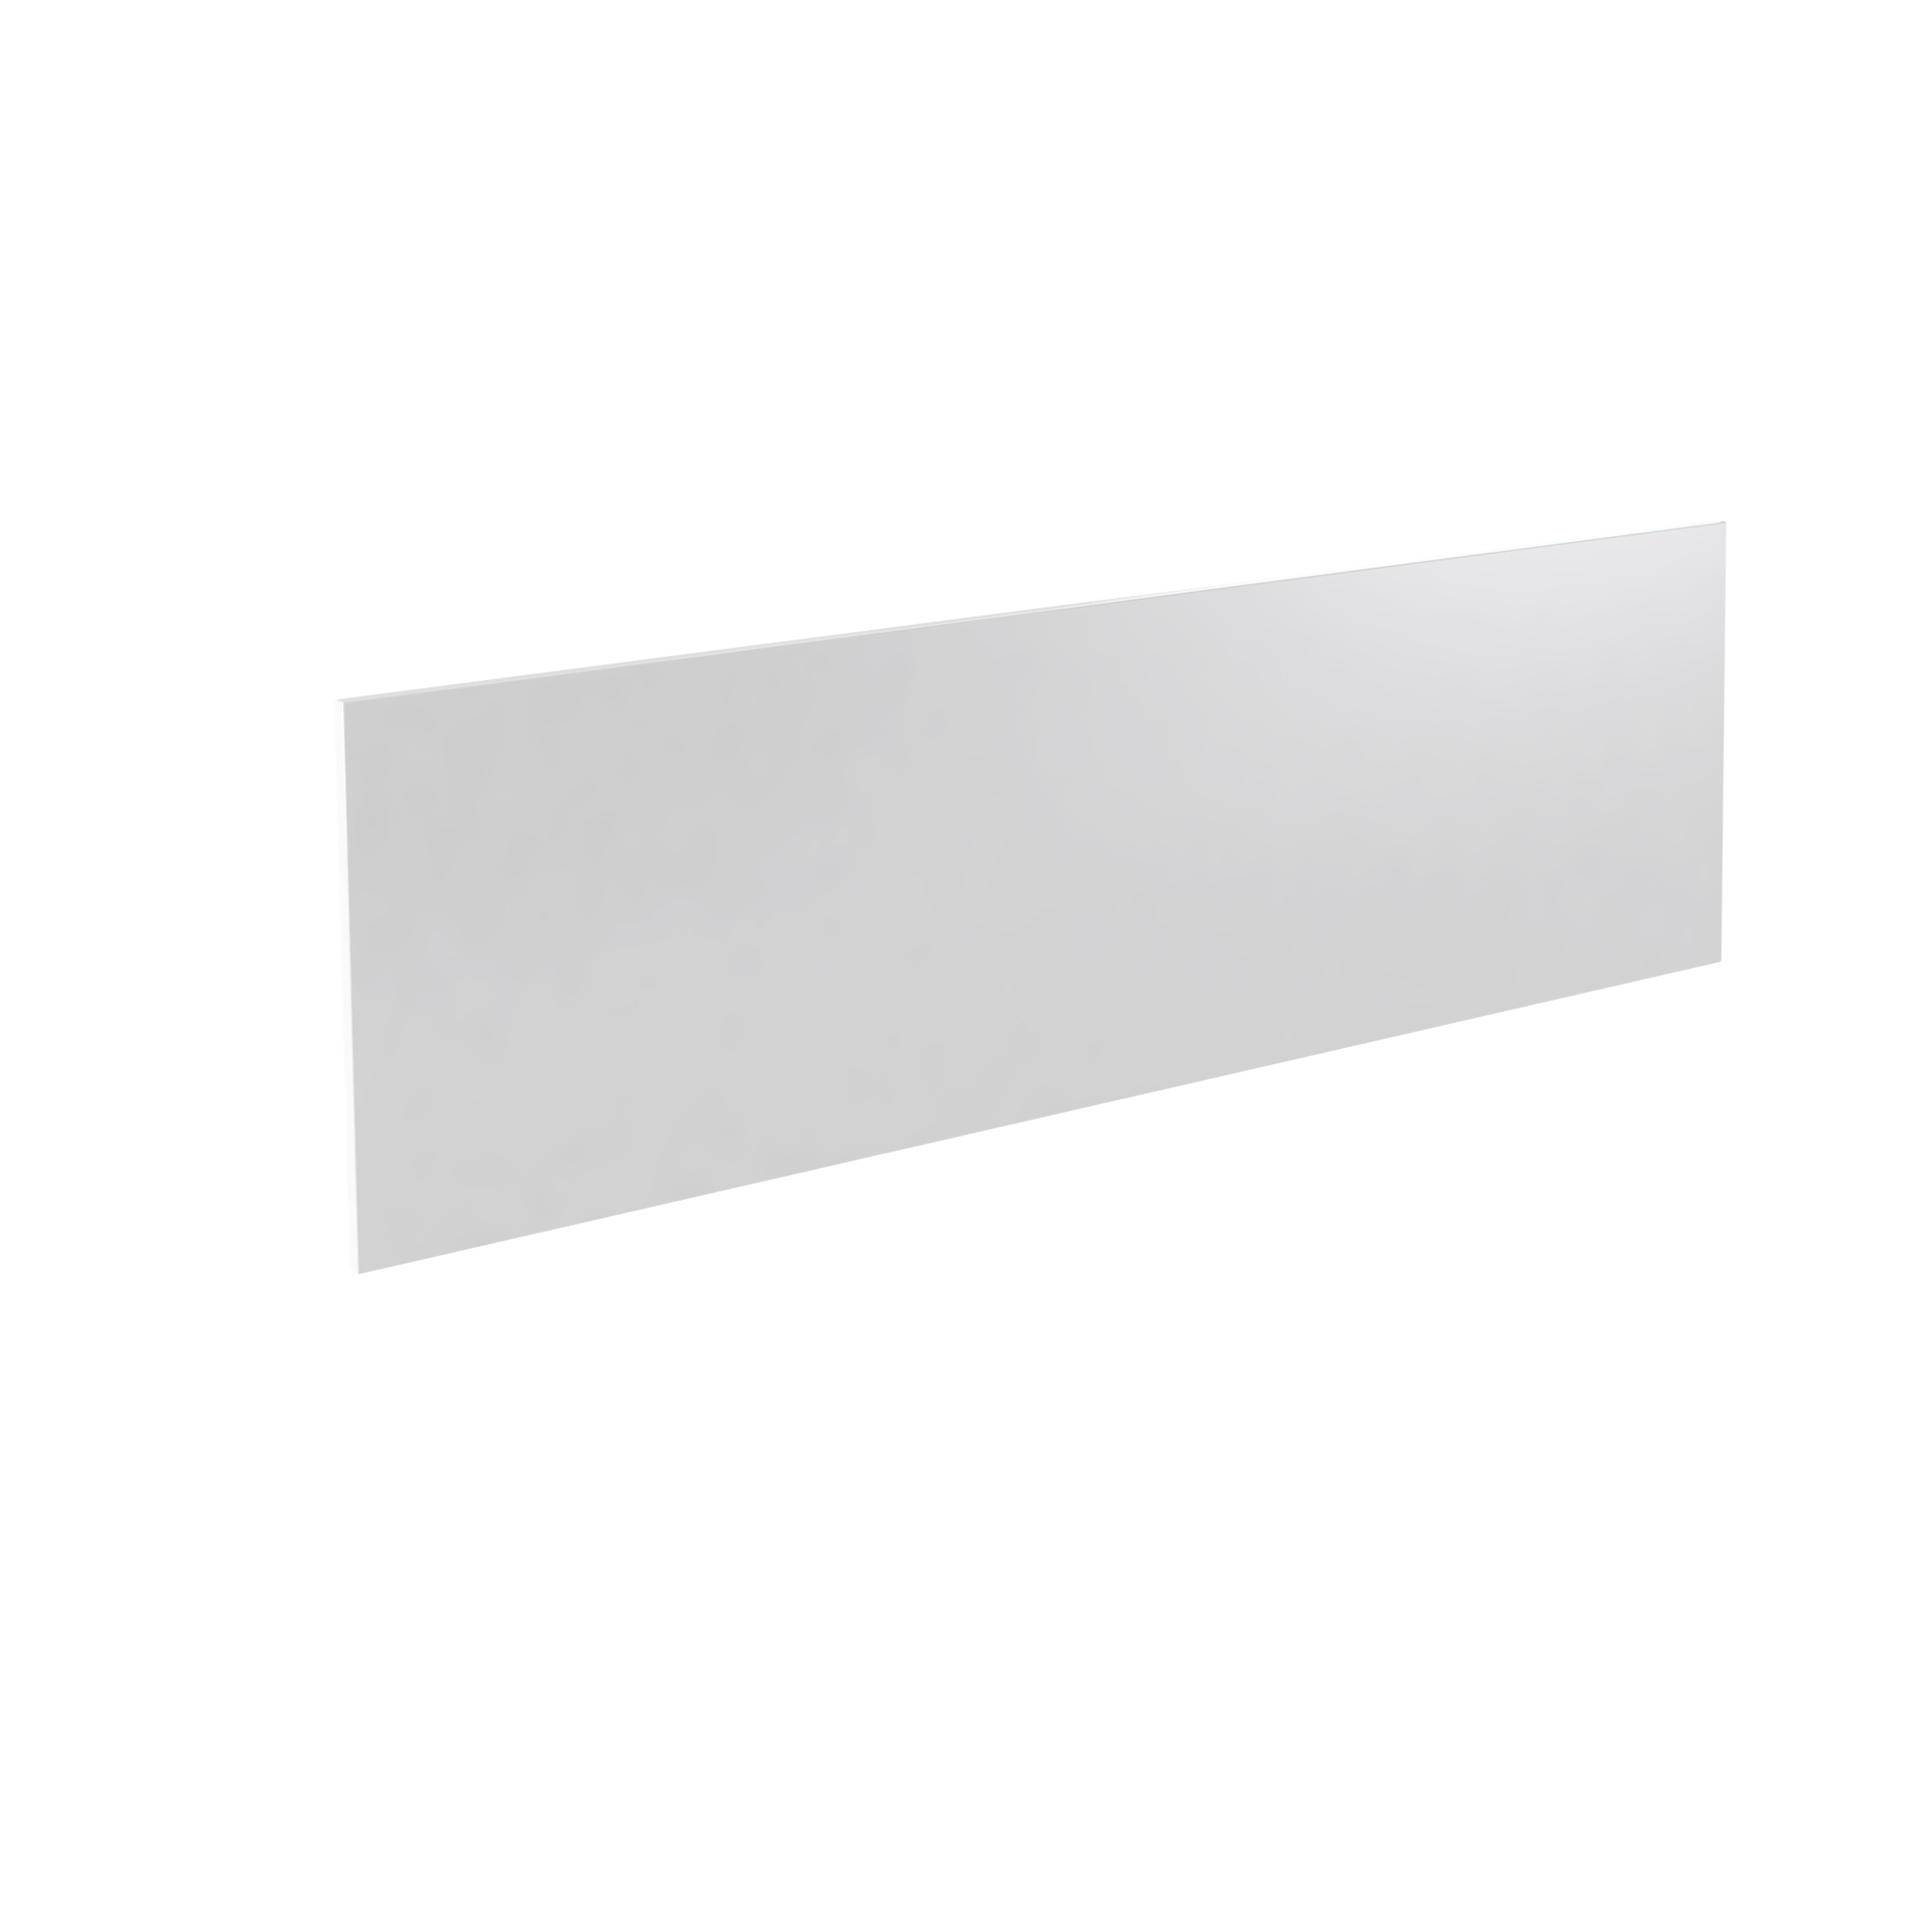 K-Vit Ikon 1700mm Bath Panel - White